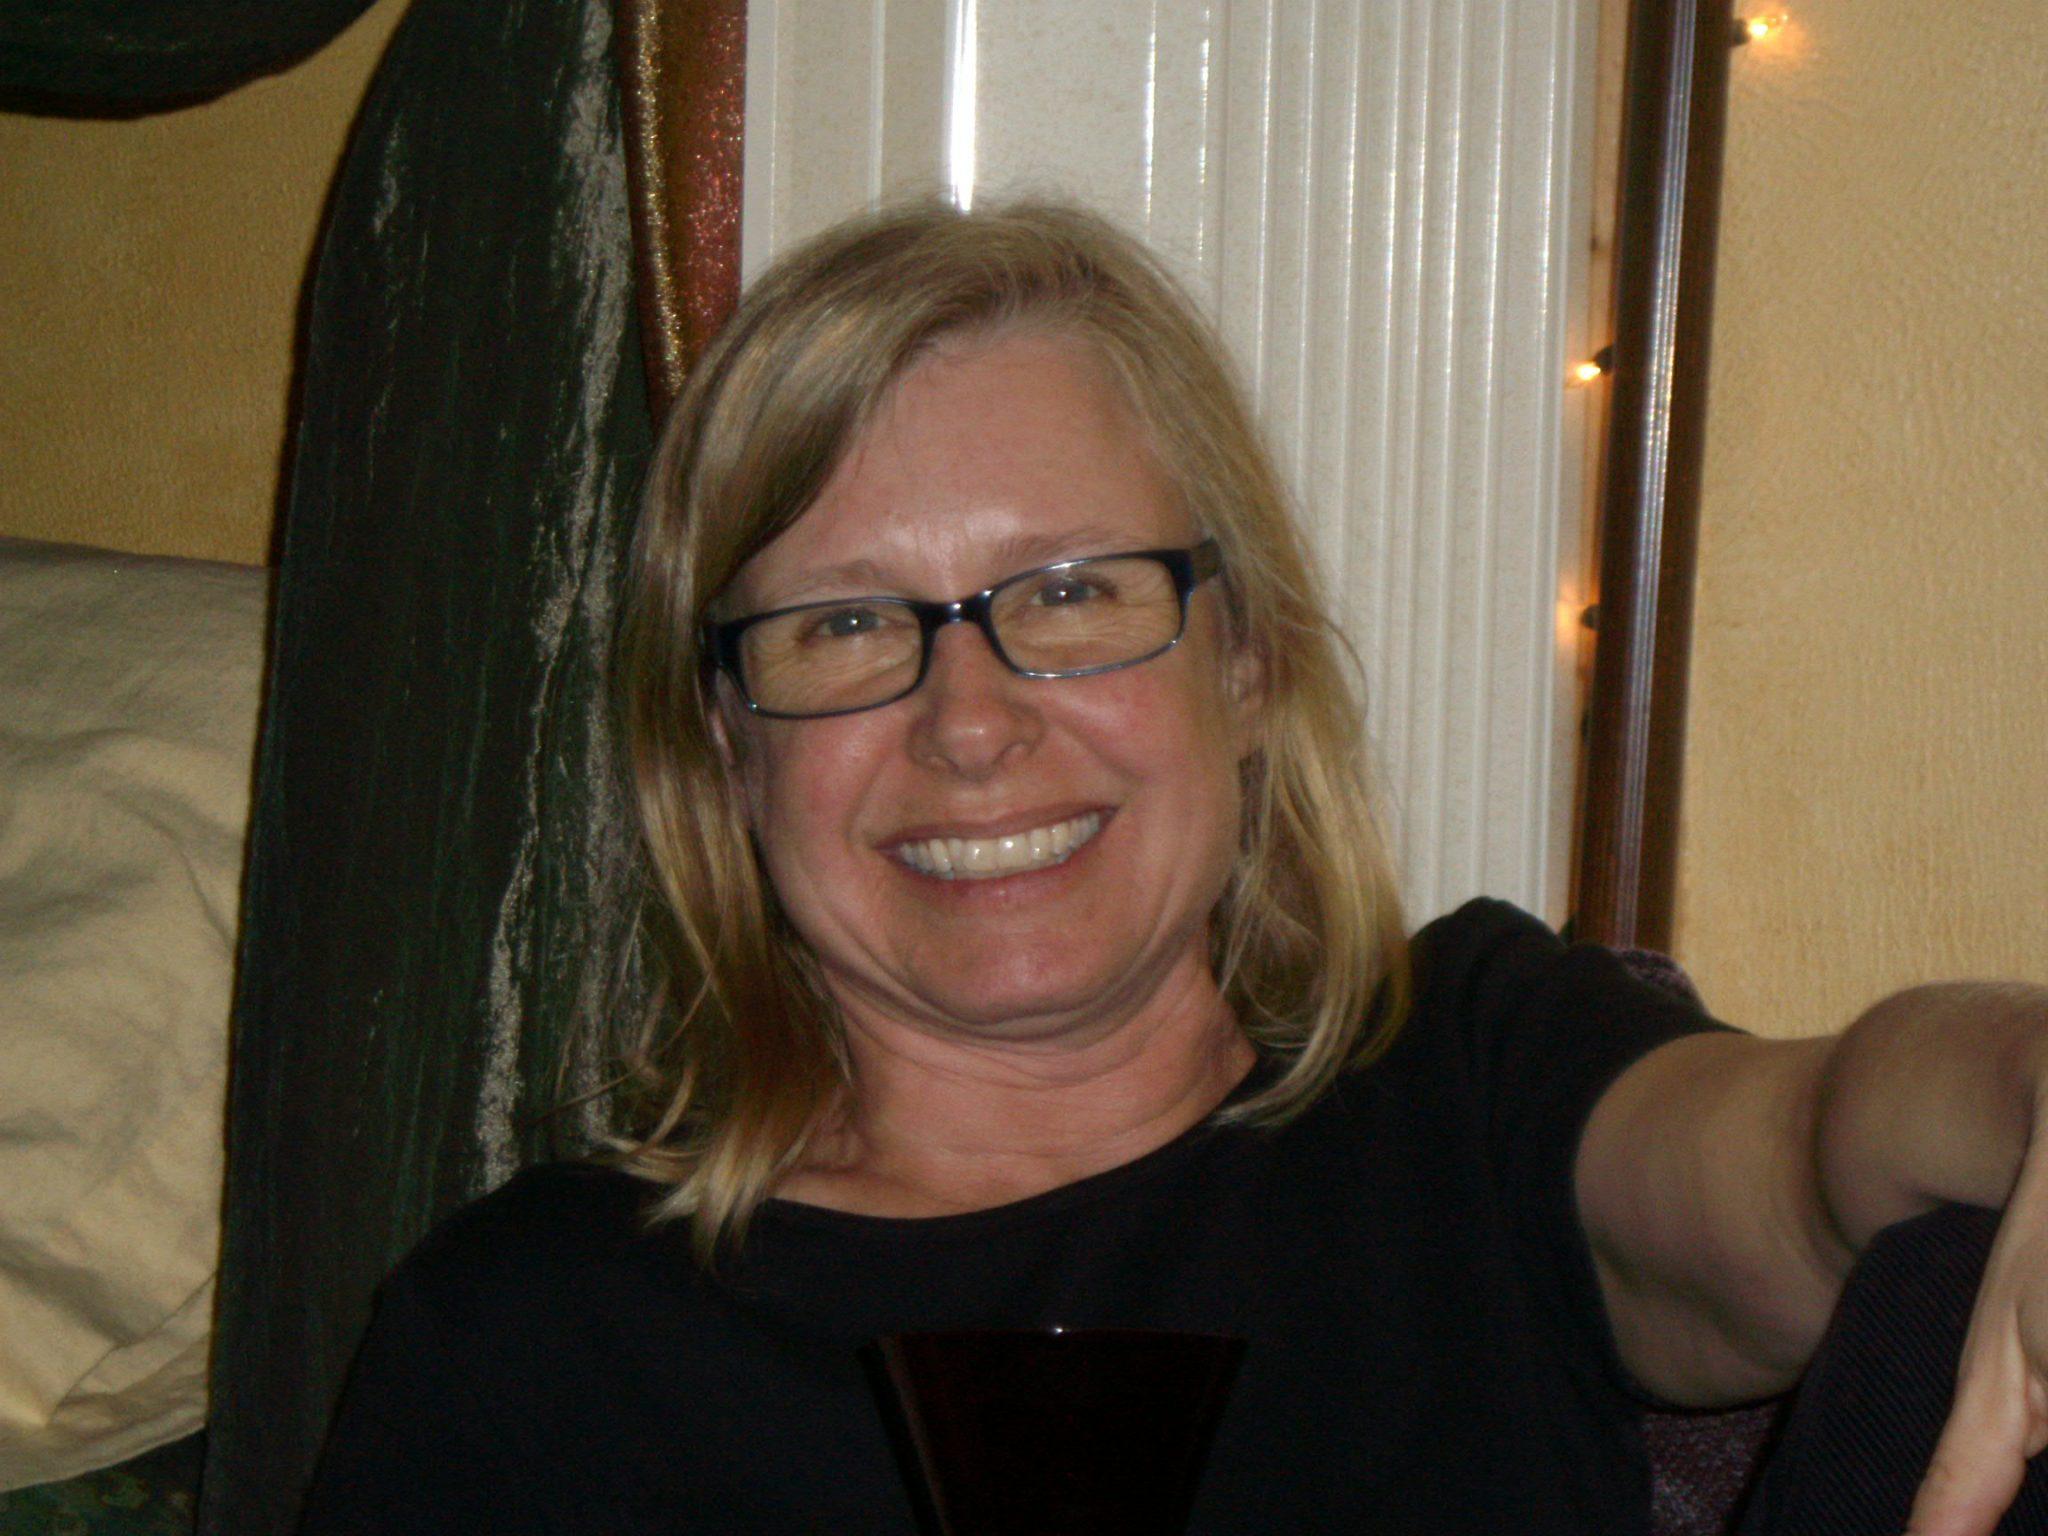 Leslie Weir